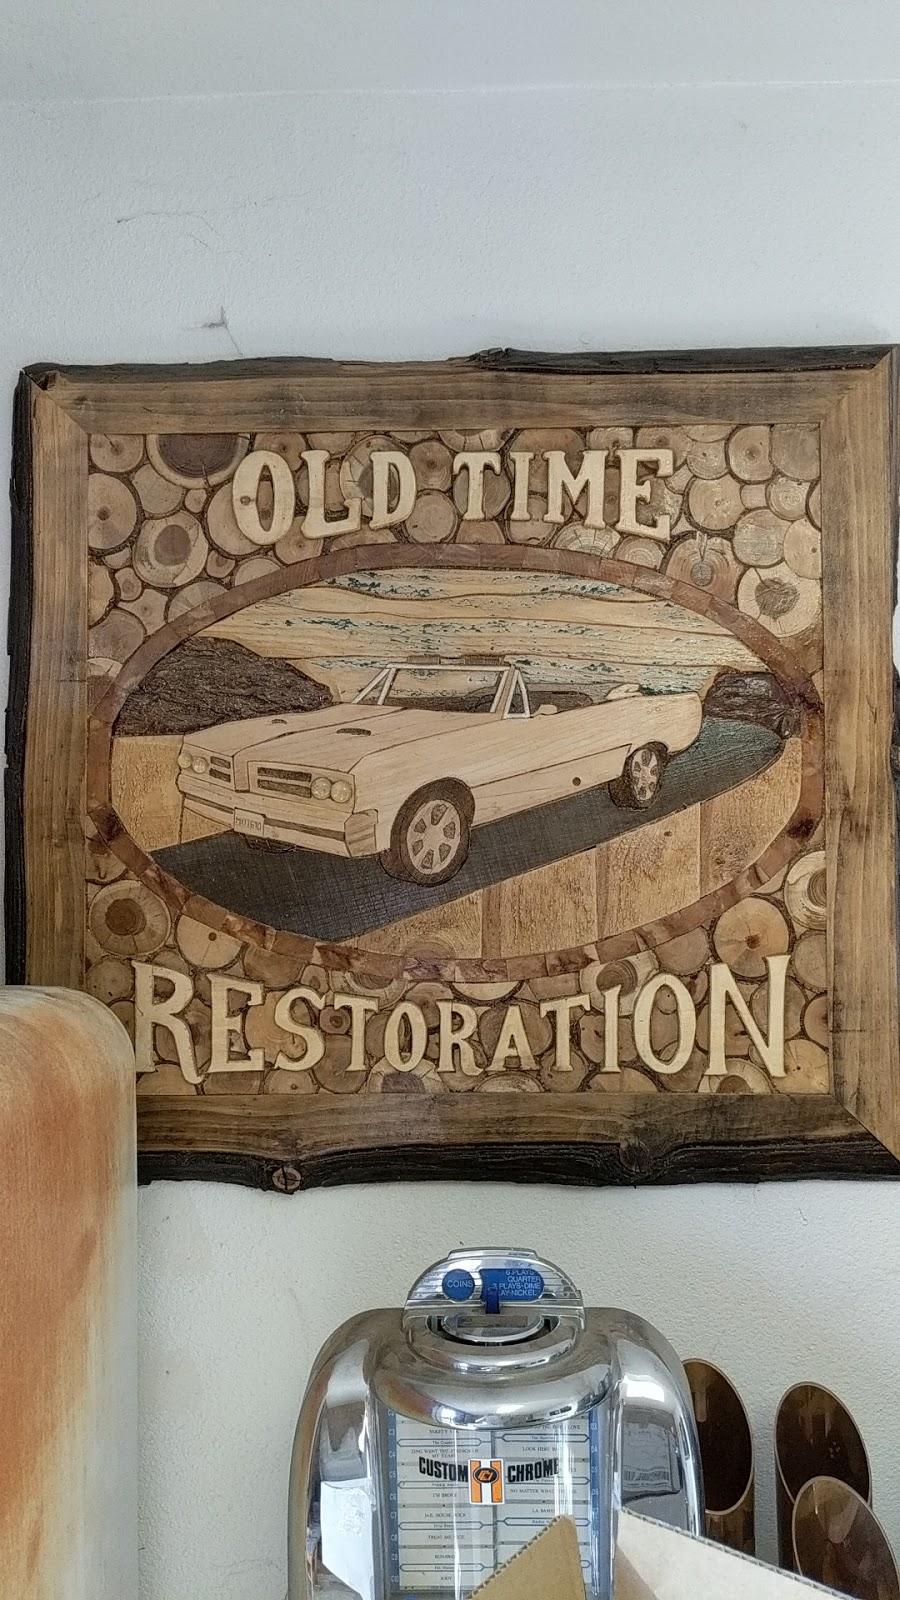 Old Time Restoration - car repair    Photo 4 of 4   Address: 3129 Swetzer Rd # F, Loomis, CA 95650, USA   Phone: (916) 303-0116